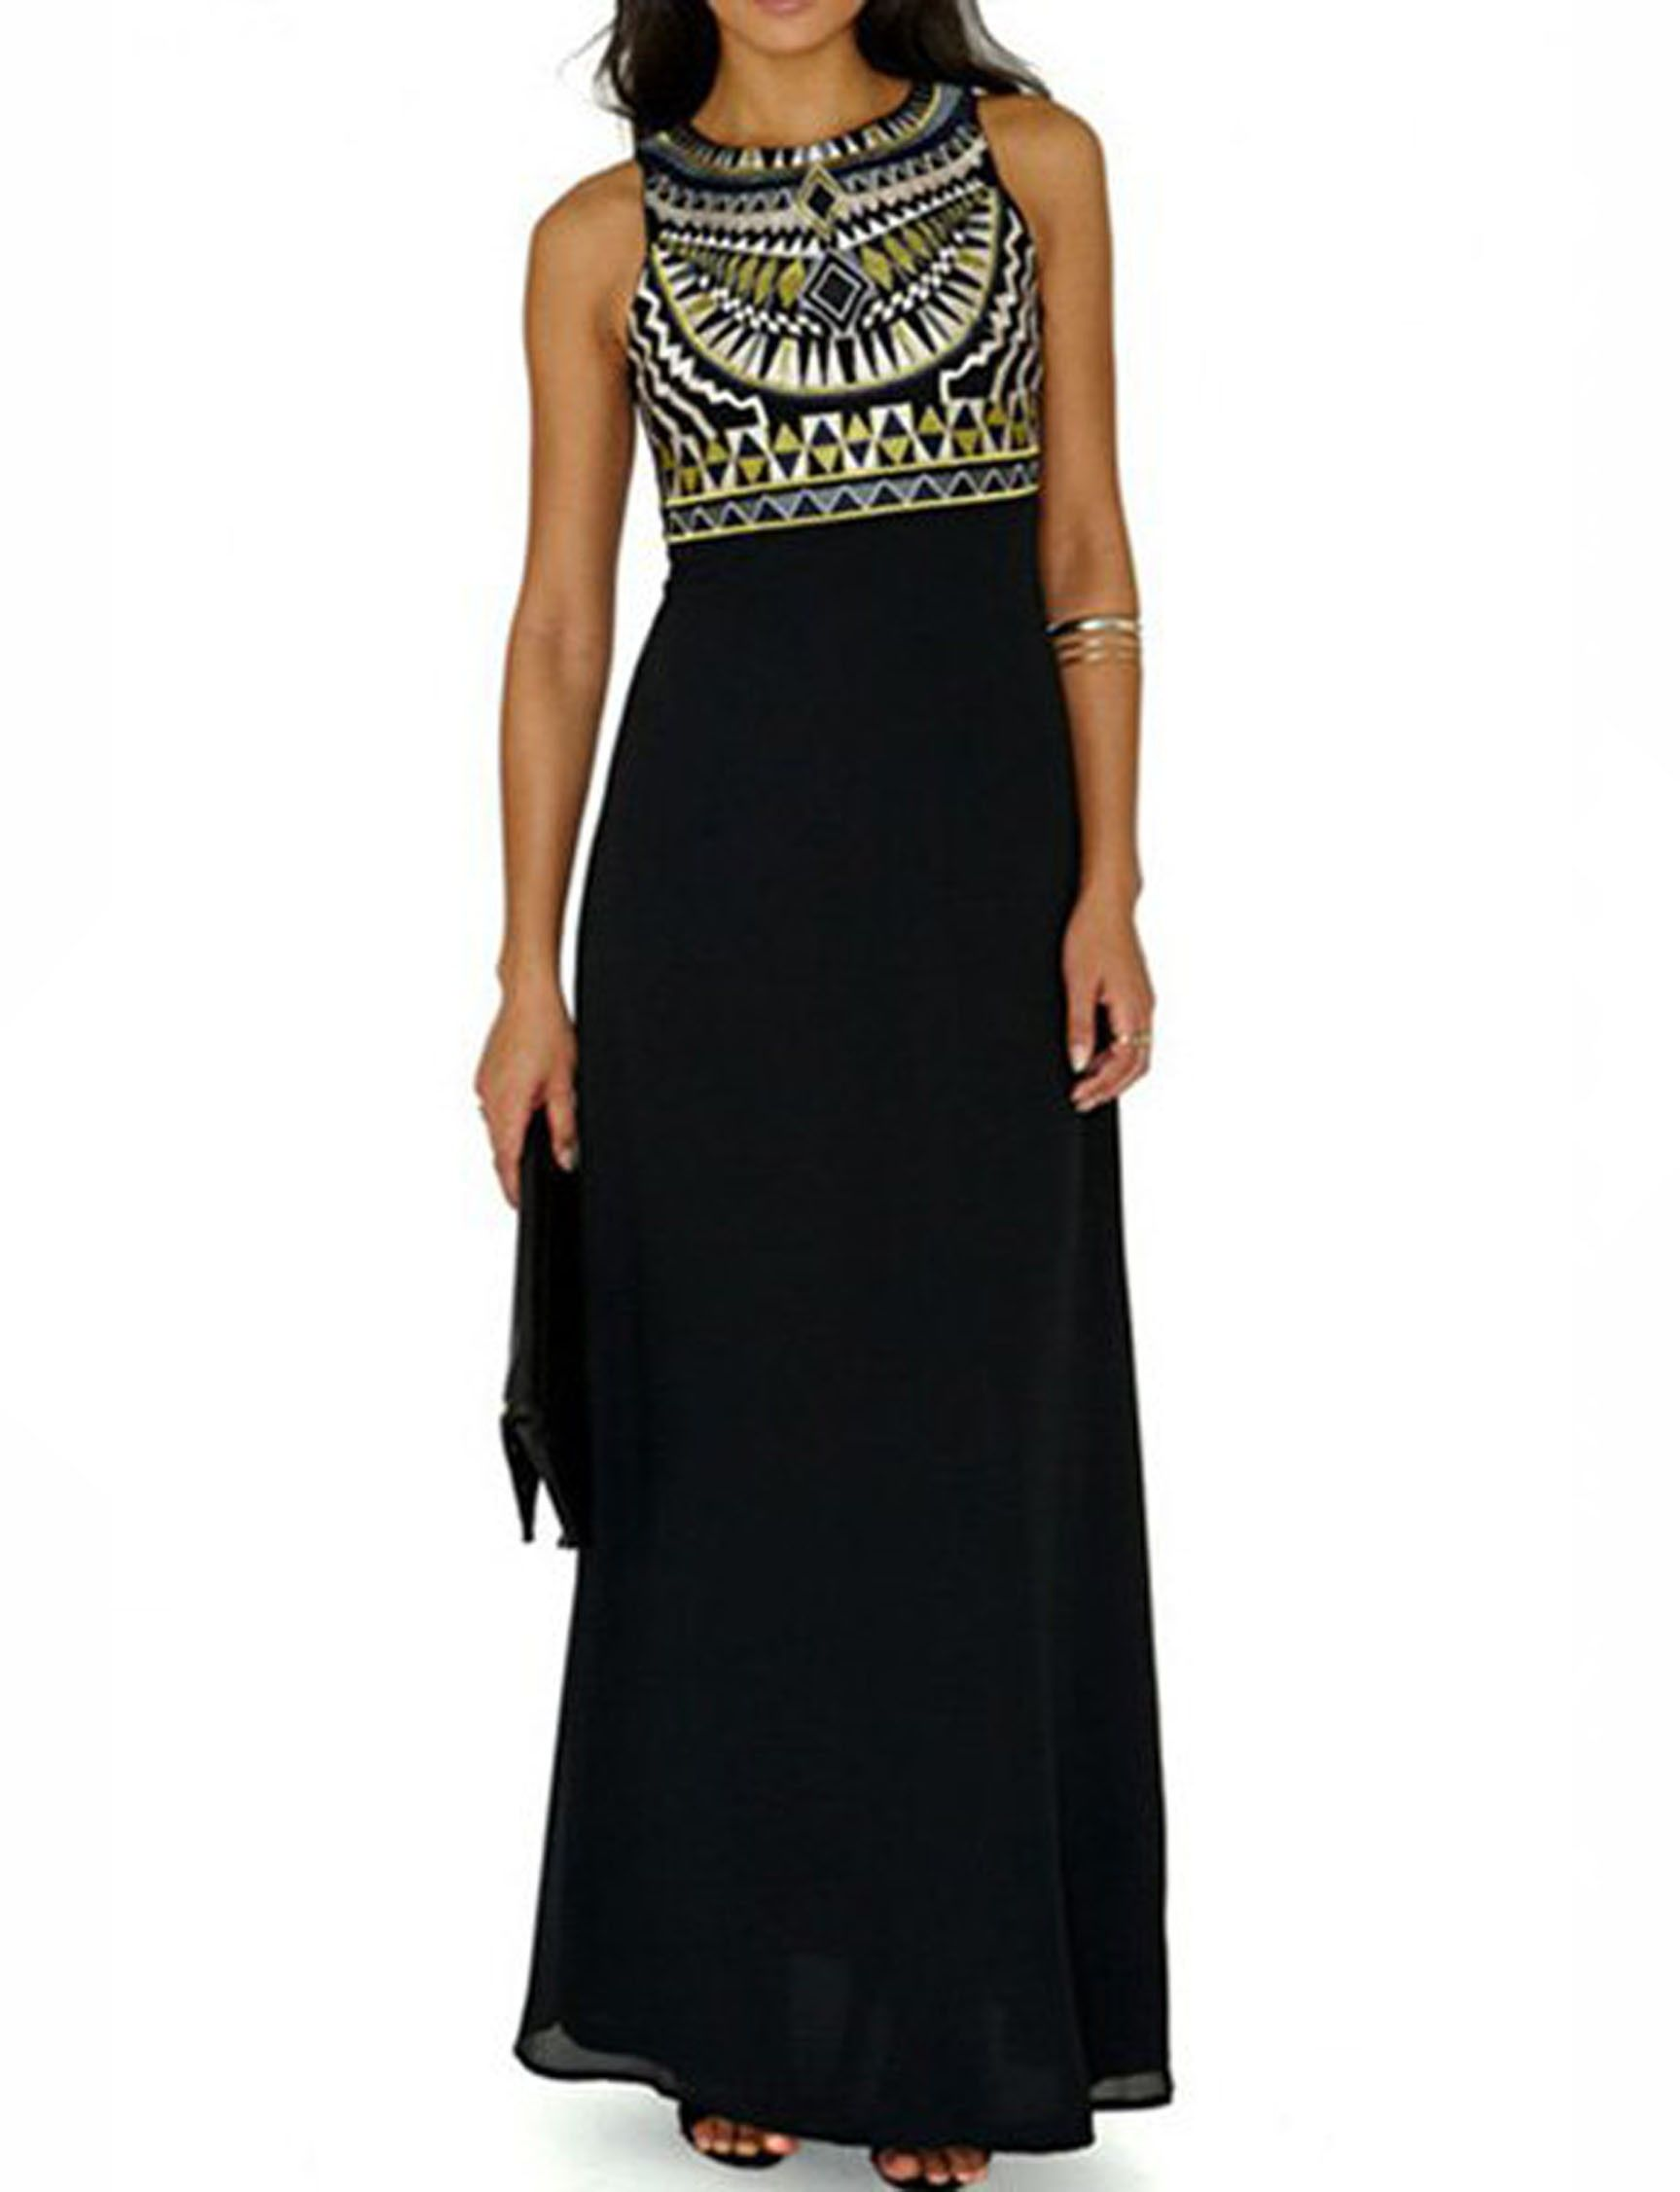 Black ethnic maxi dress womenus fashion pinterest ethnic maxi